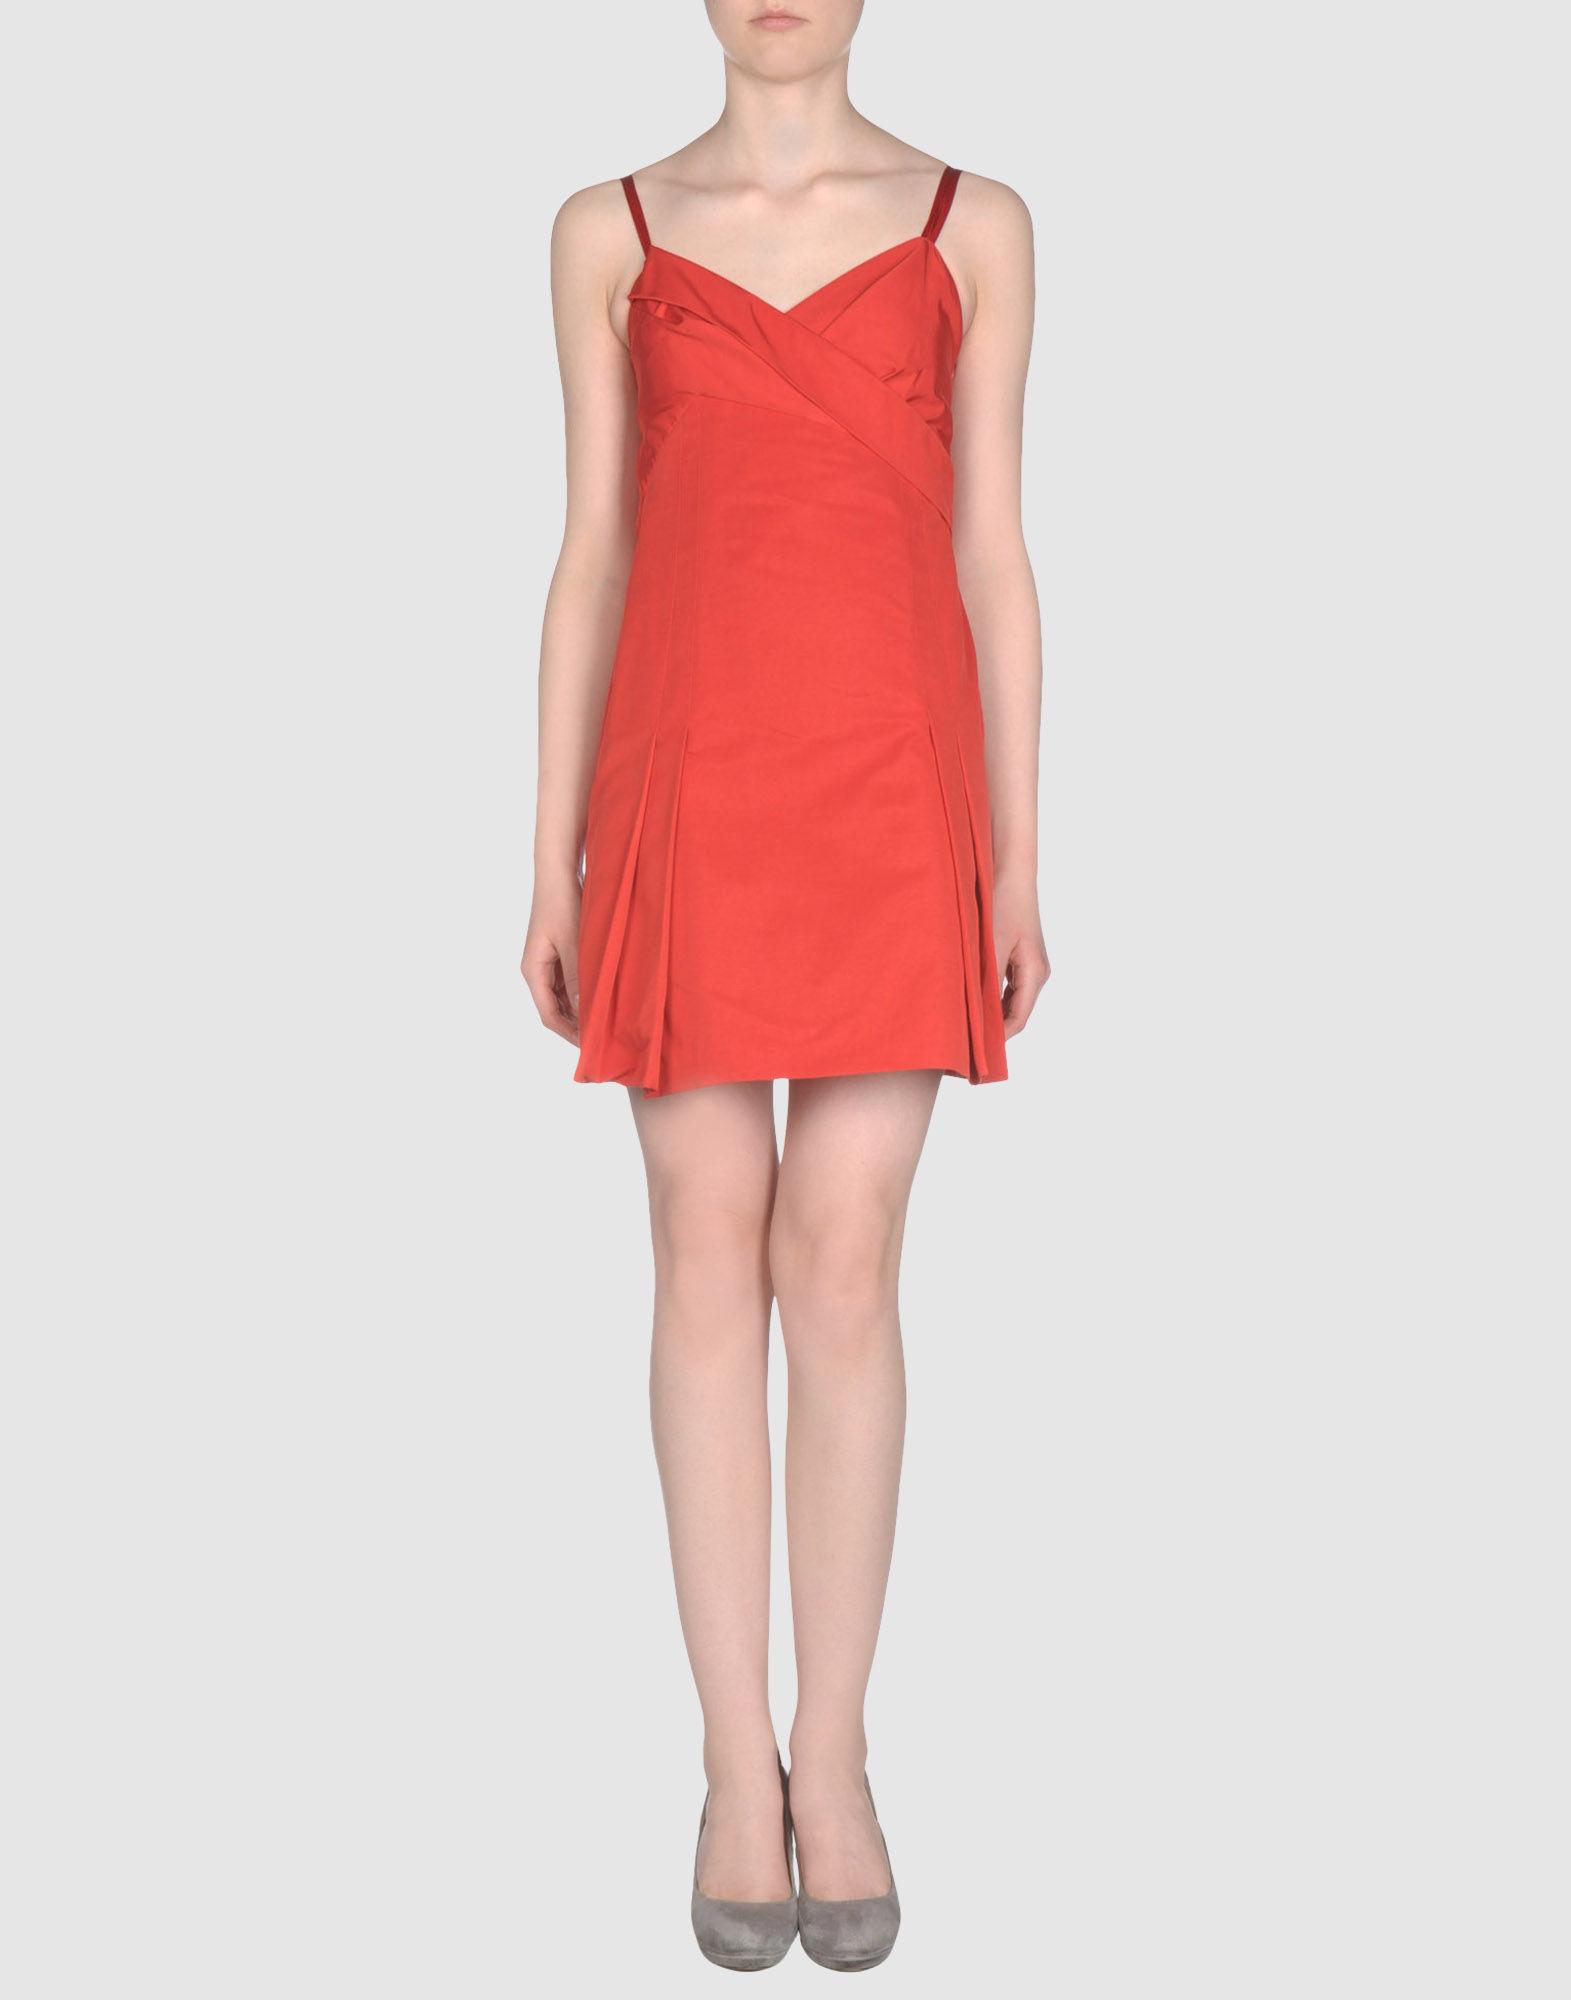 Red Valentino Spring 2016: Red Valentino Short Dress In Red